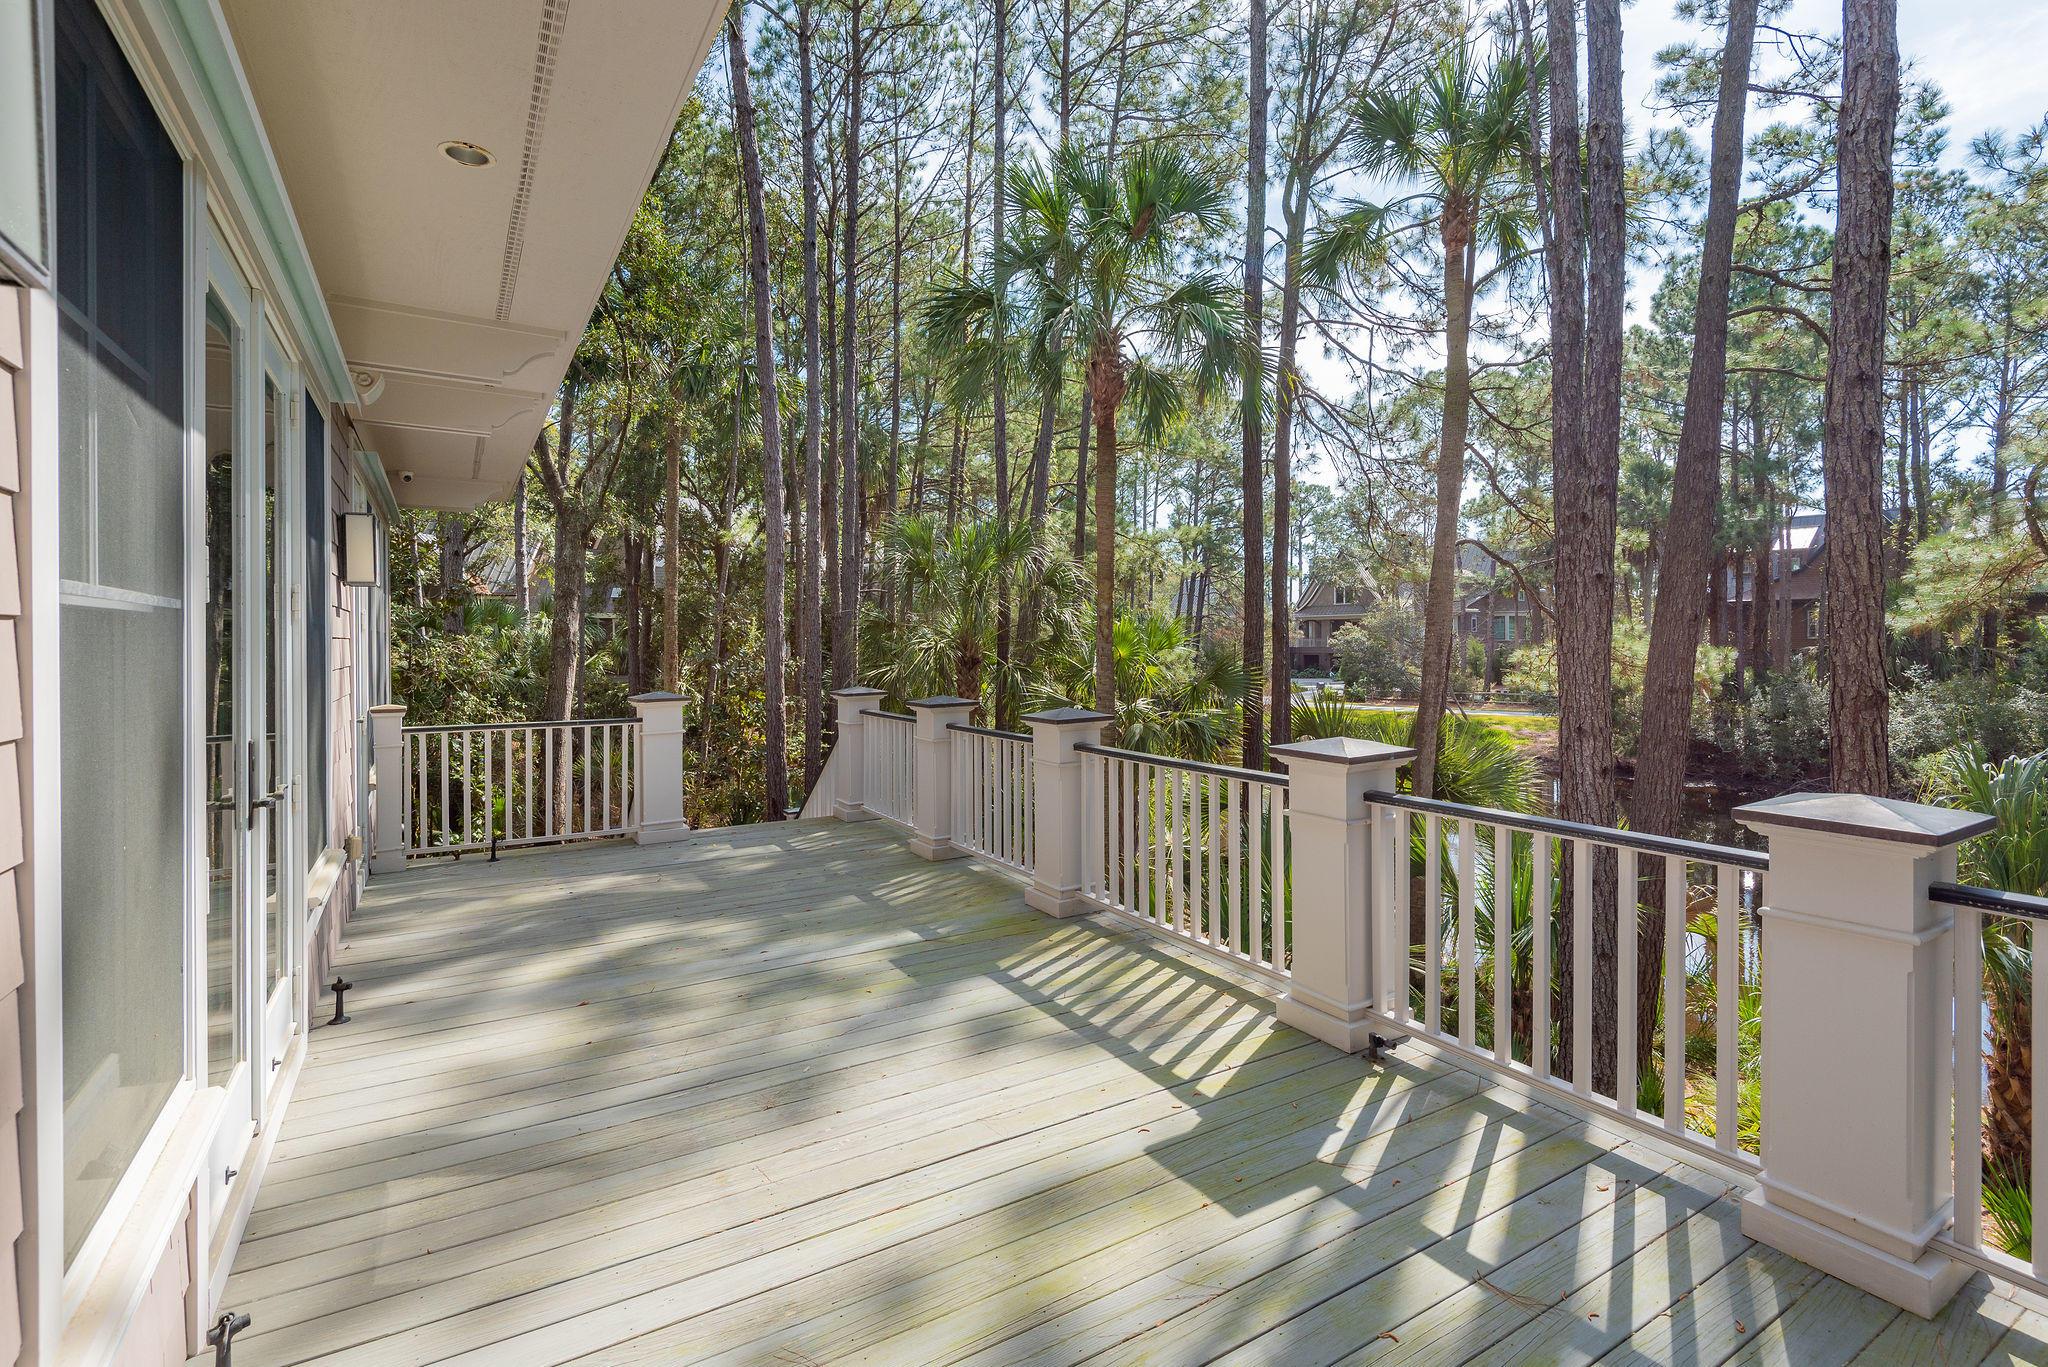 Kiawah Island Homes For Sale - 3 Grey Widgeon, Kiawah Island, SC - 37